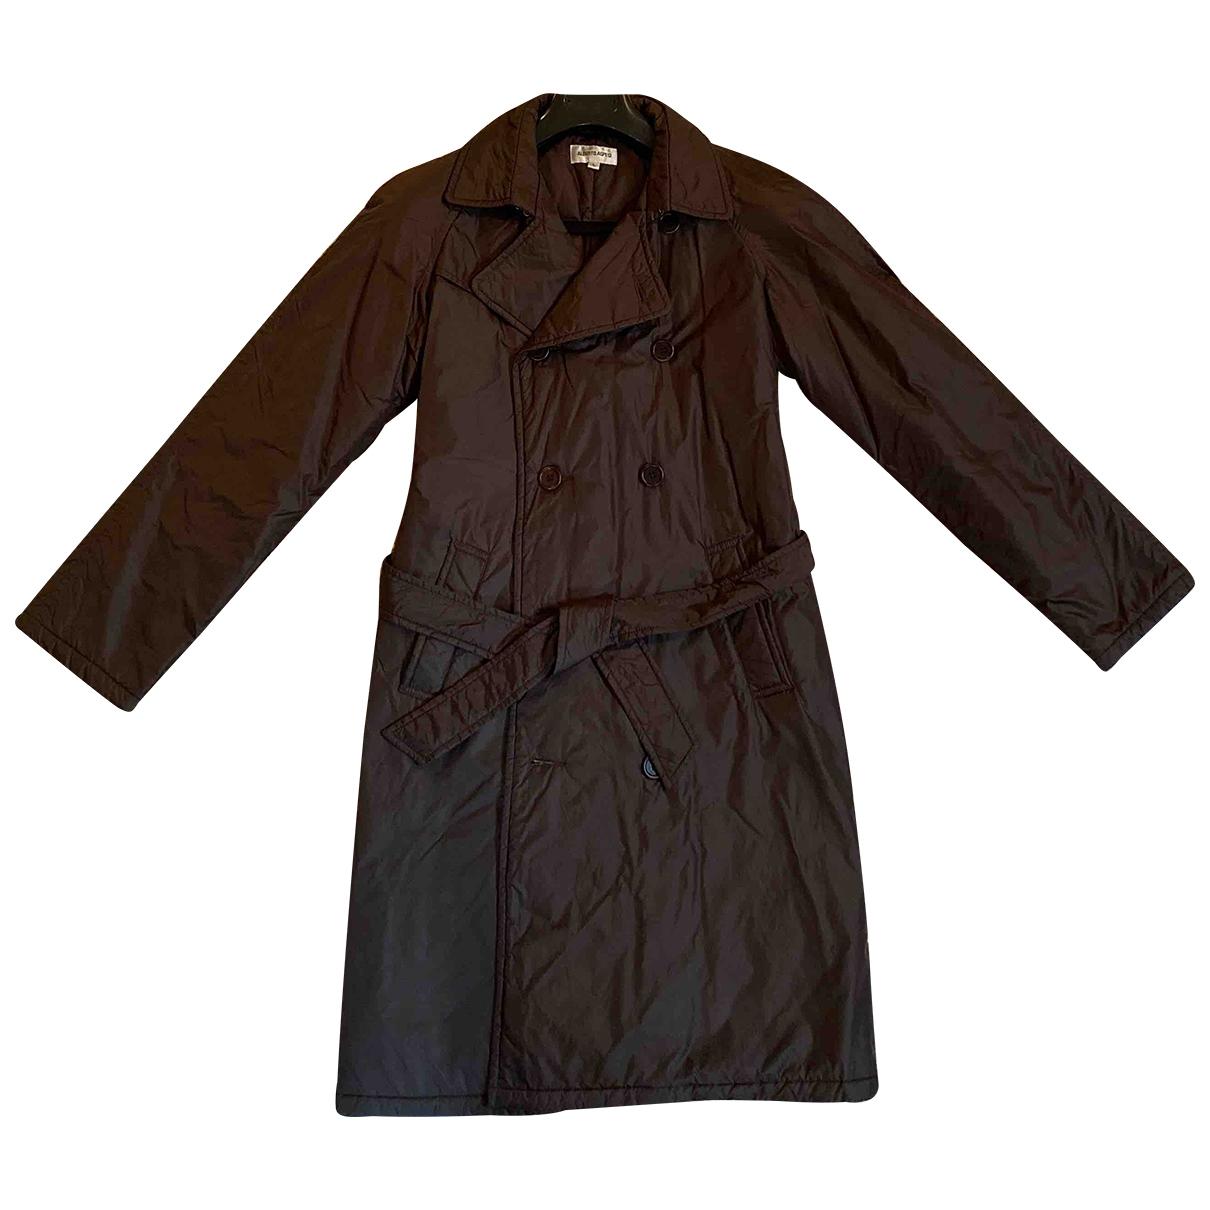 Aspesi \N Brown coat for Women 46 IT